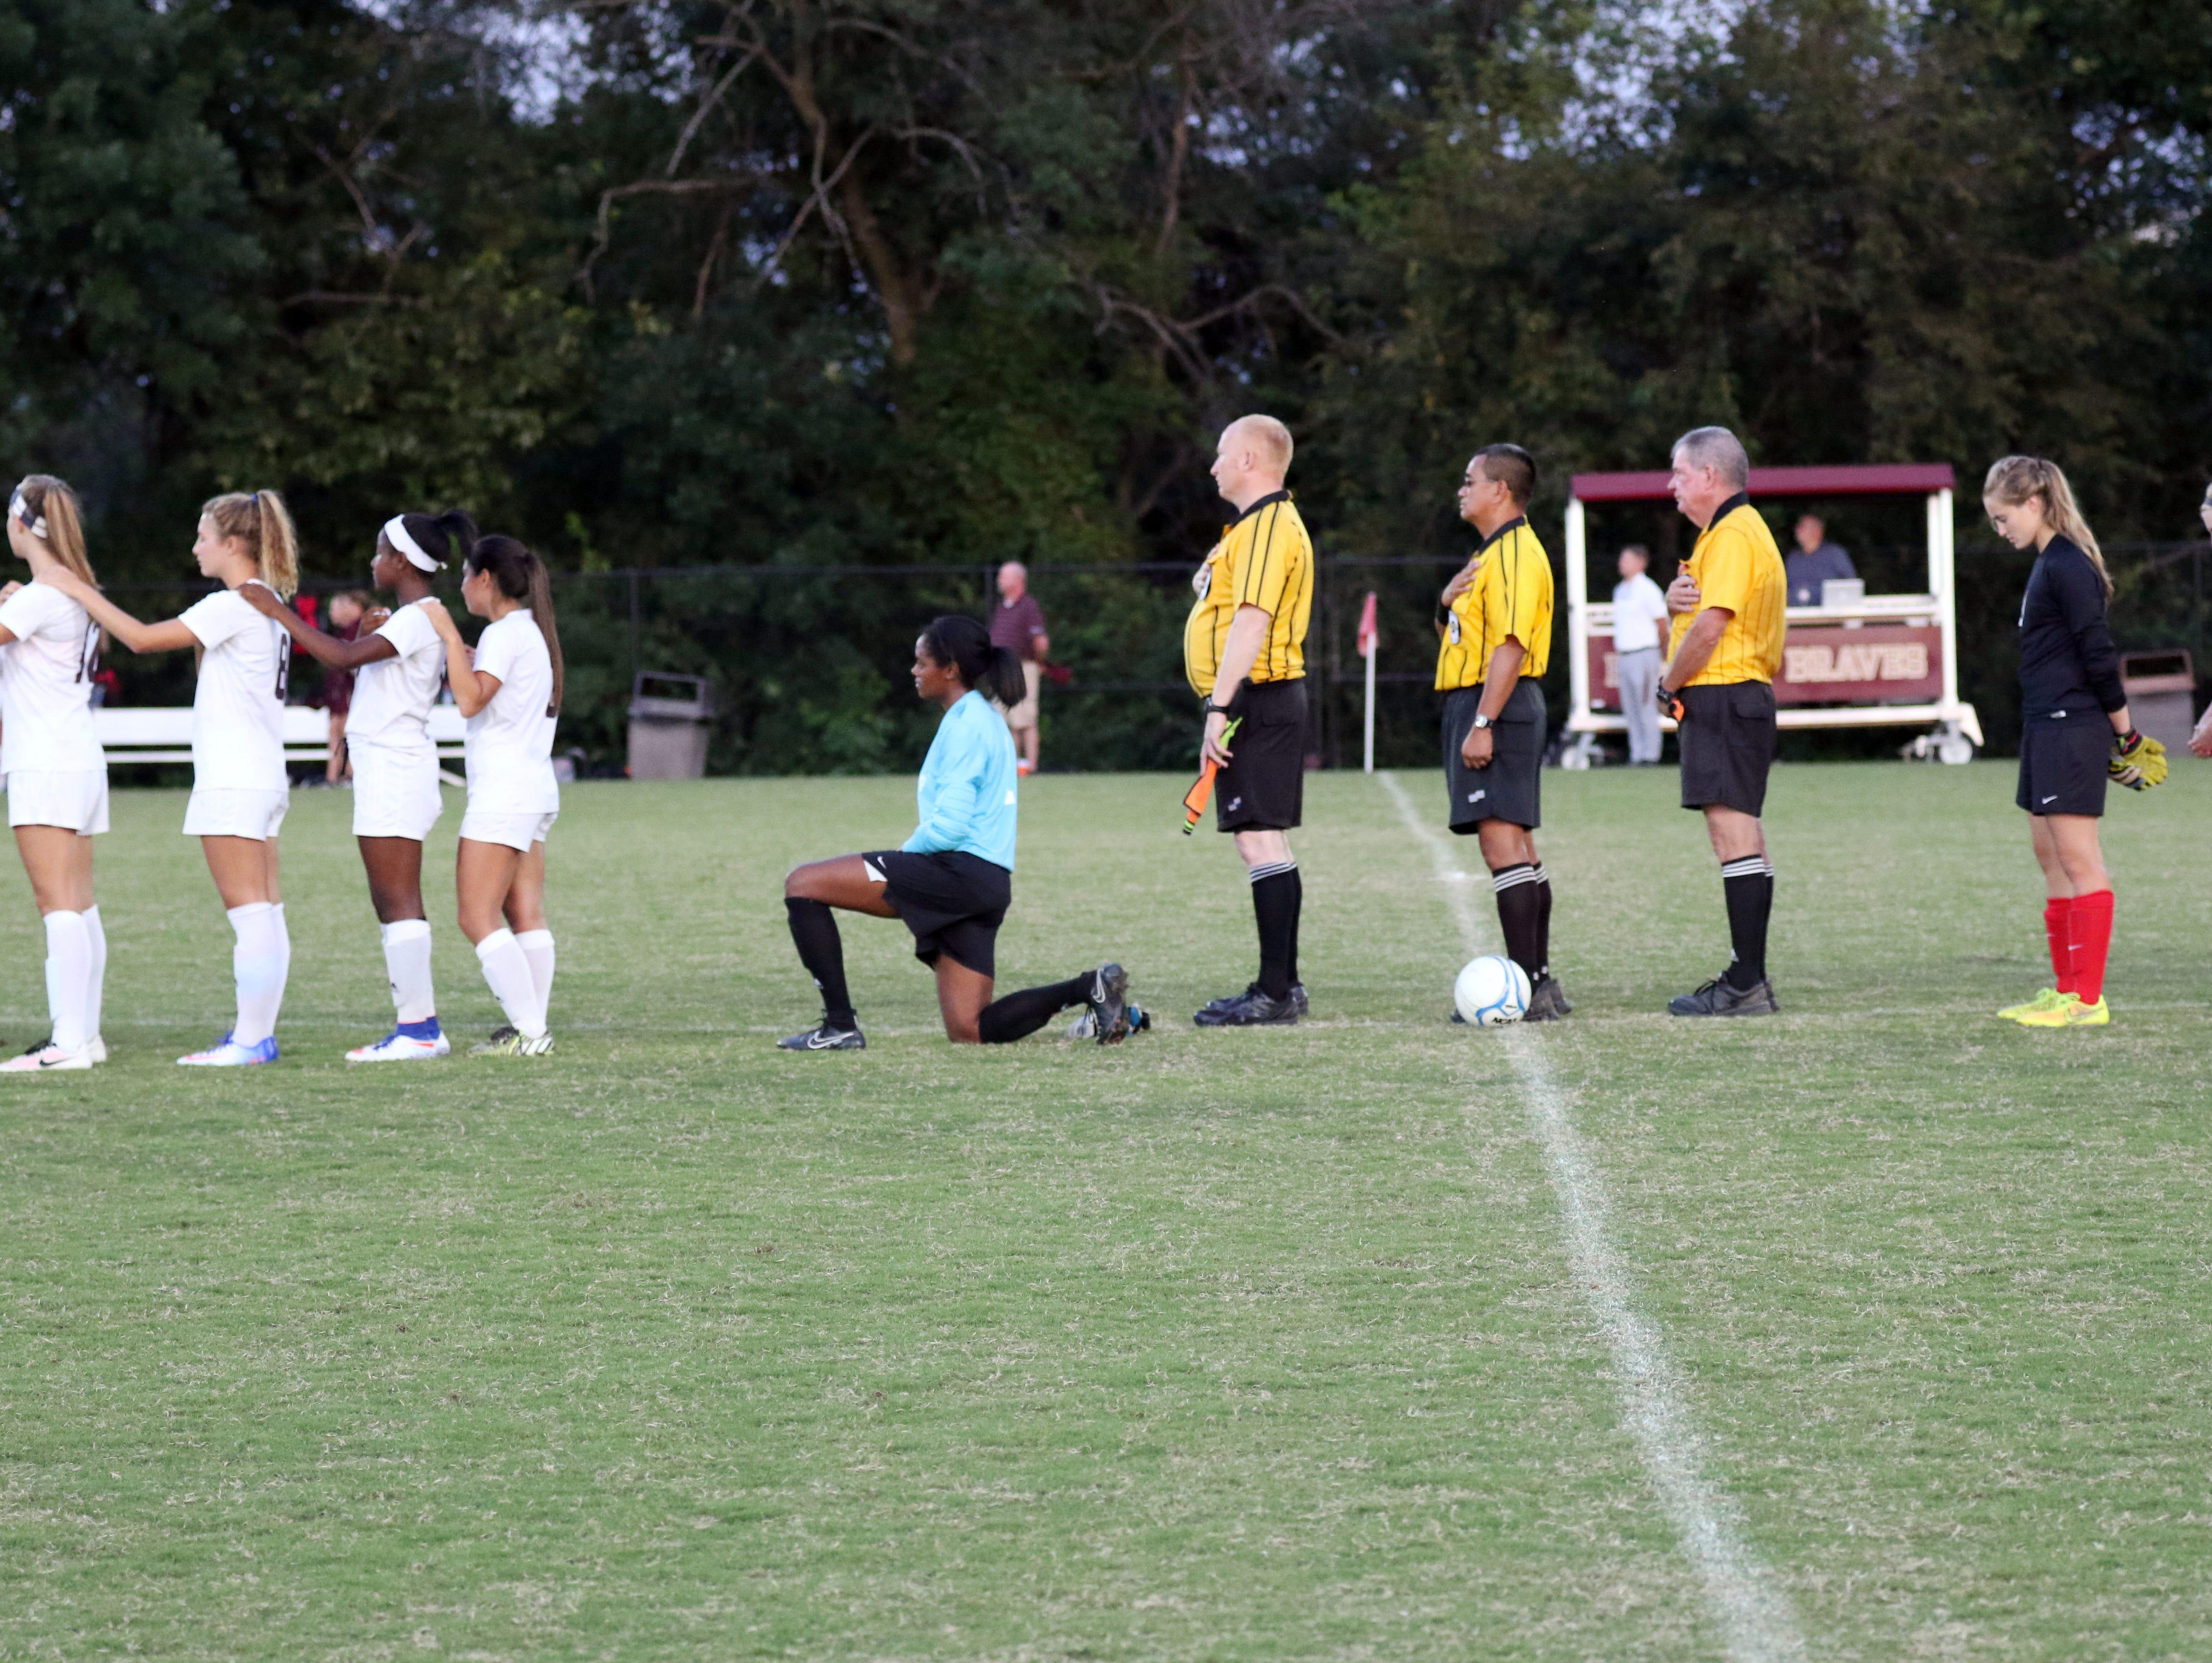 Brebeuf Jesuit player kneels during national anthem | USA ...